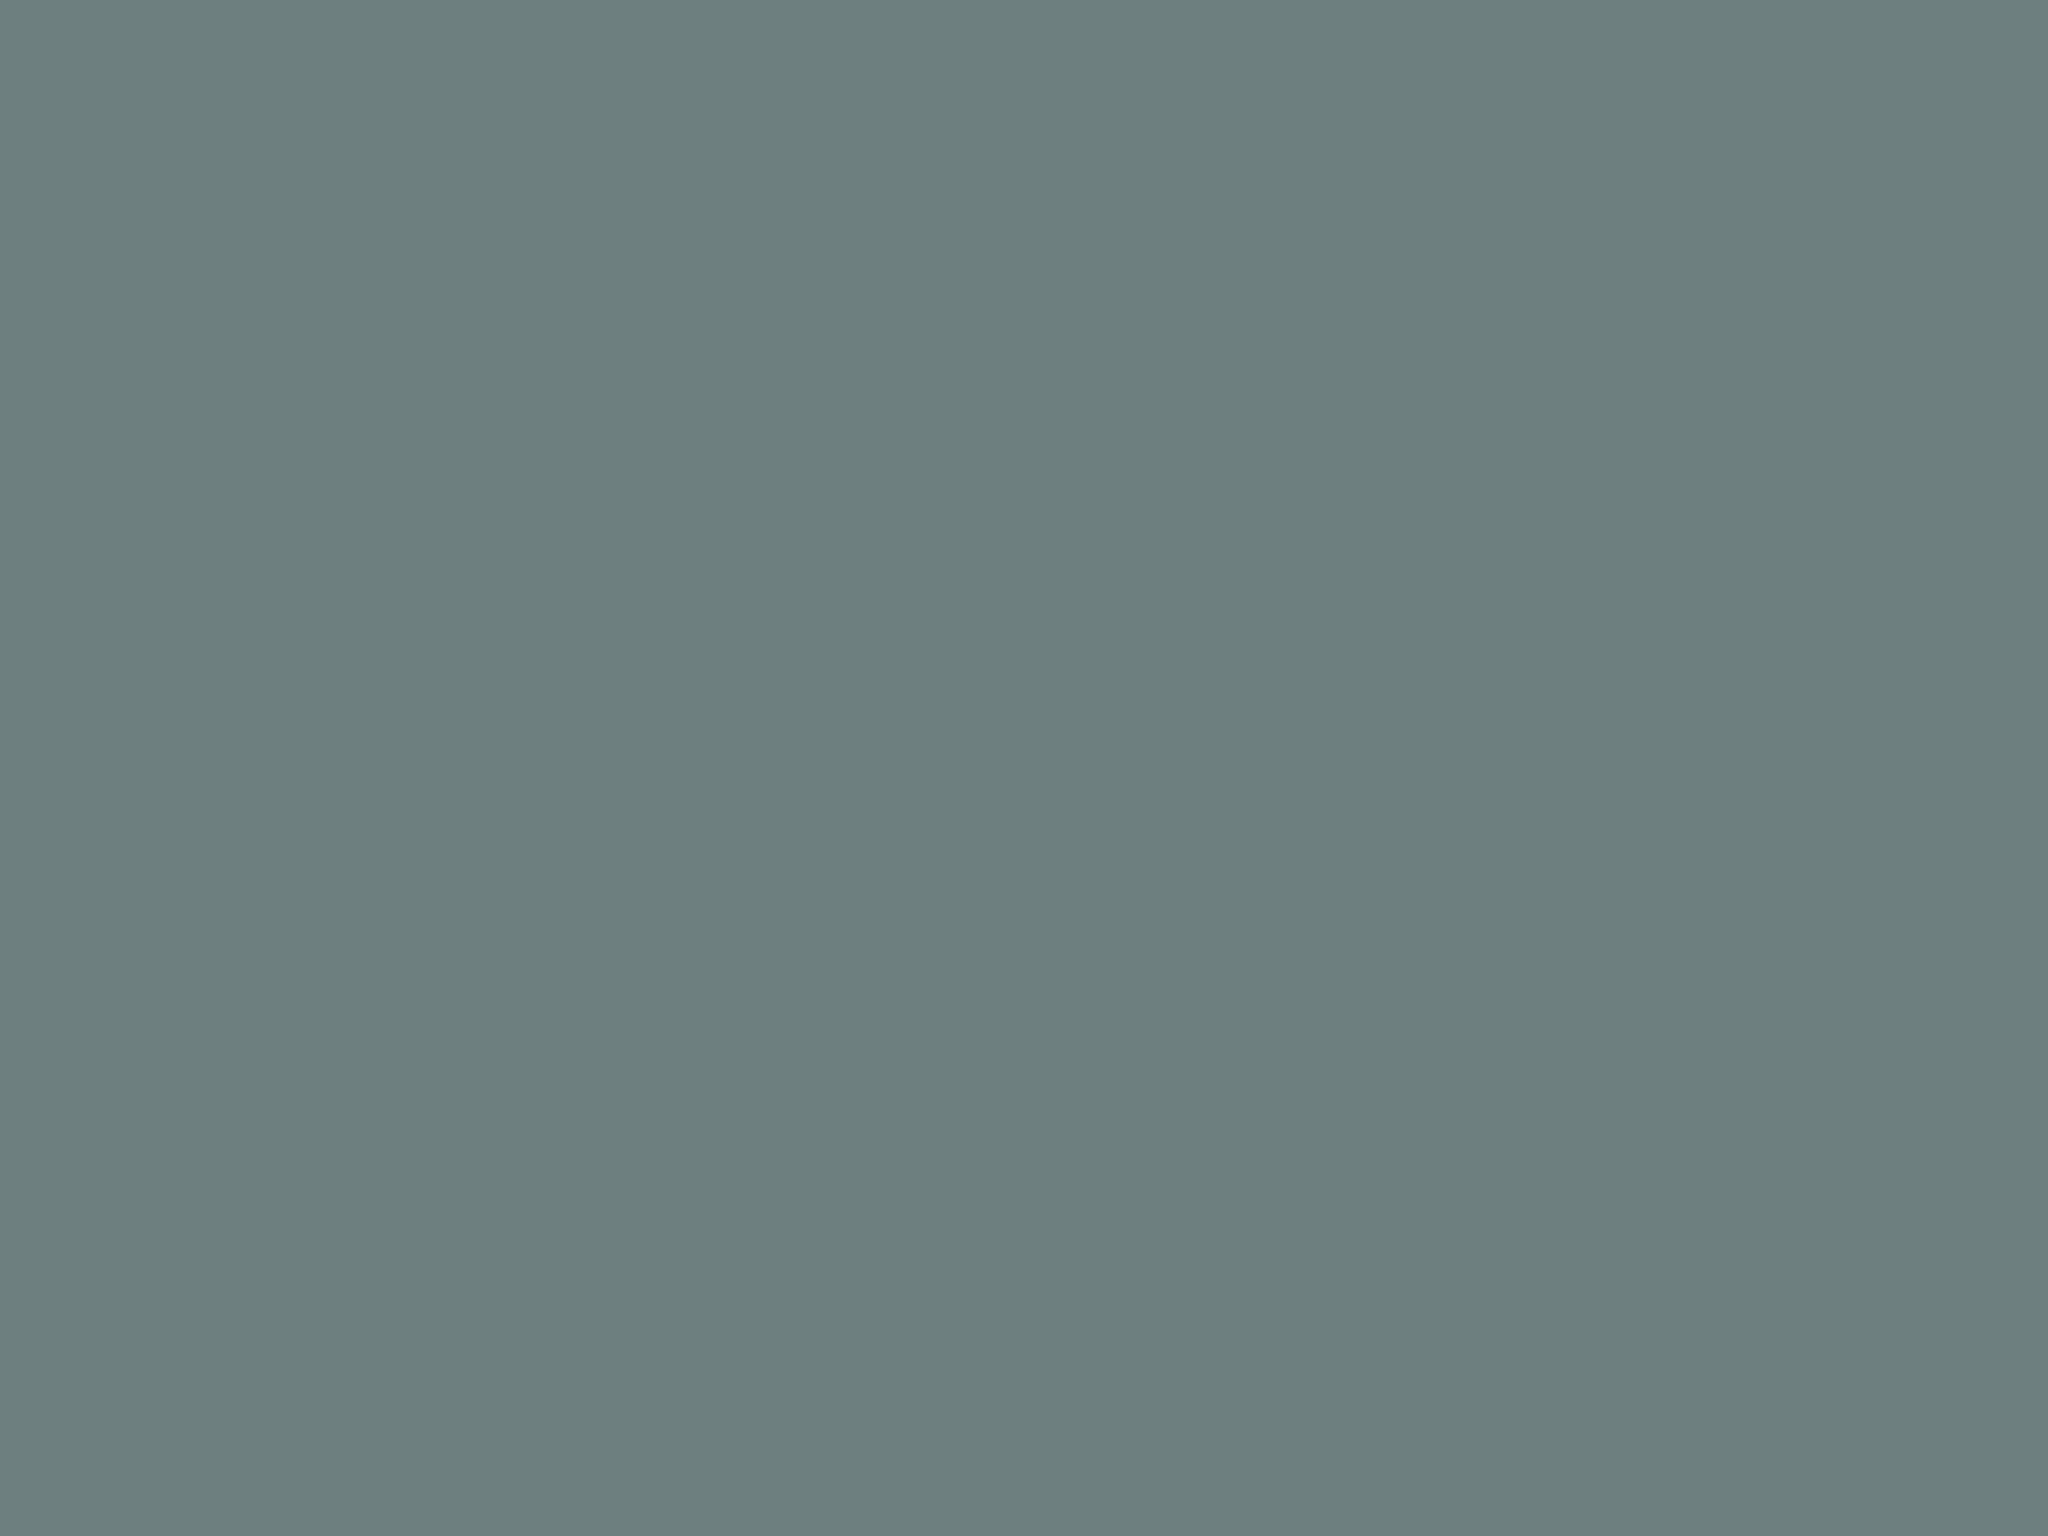 2048x1536 AuroMetalSaurus Solid Color Background